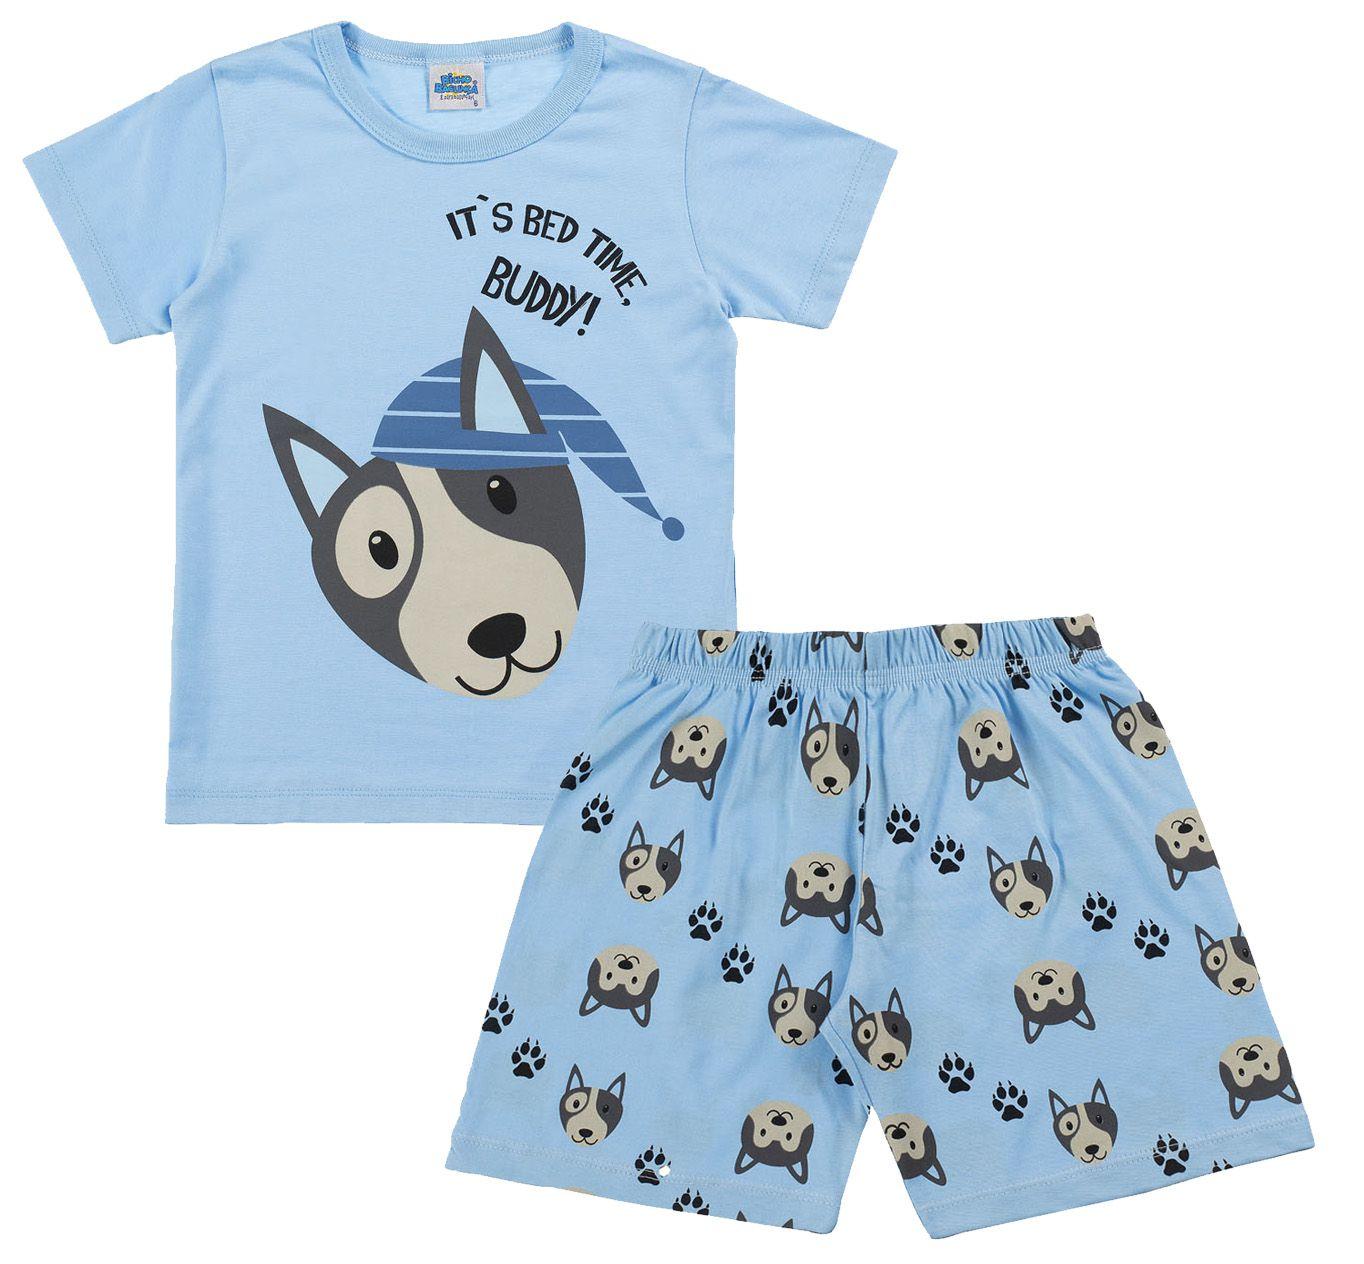 Pijama Buddy Azul Bicho Bagunça